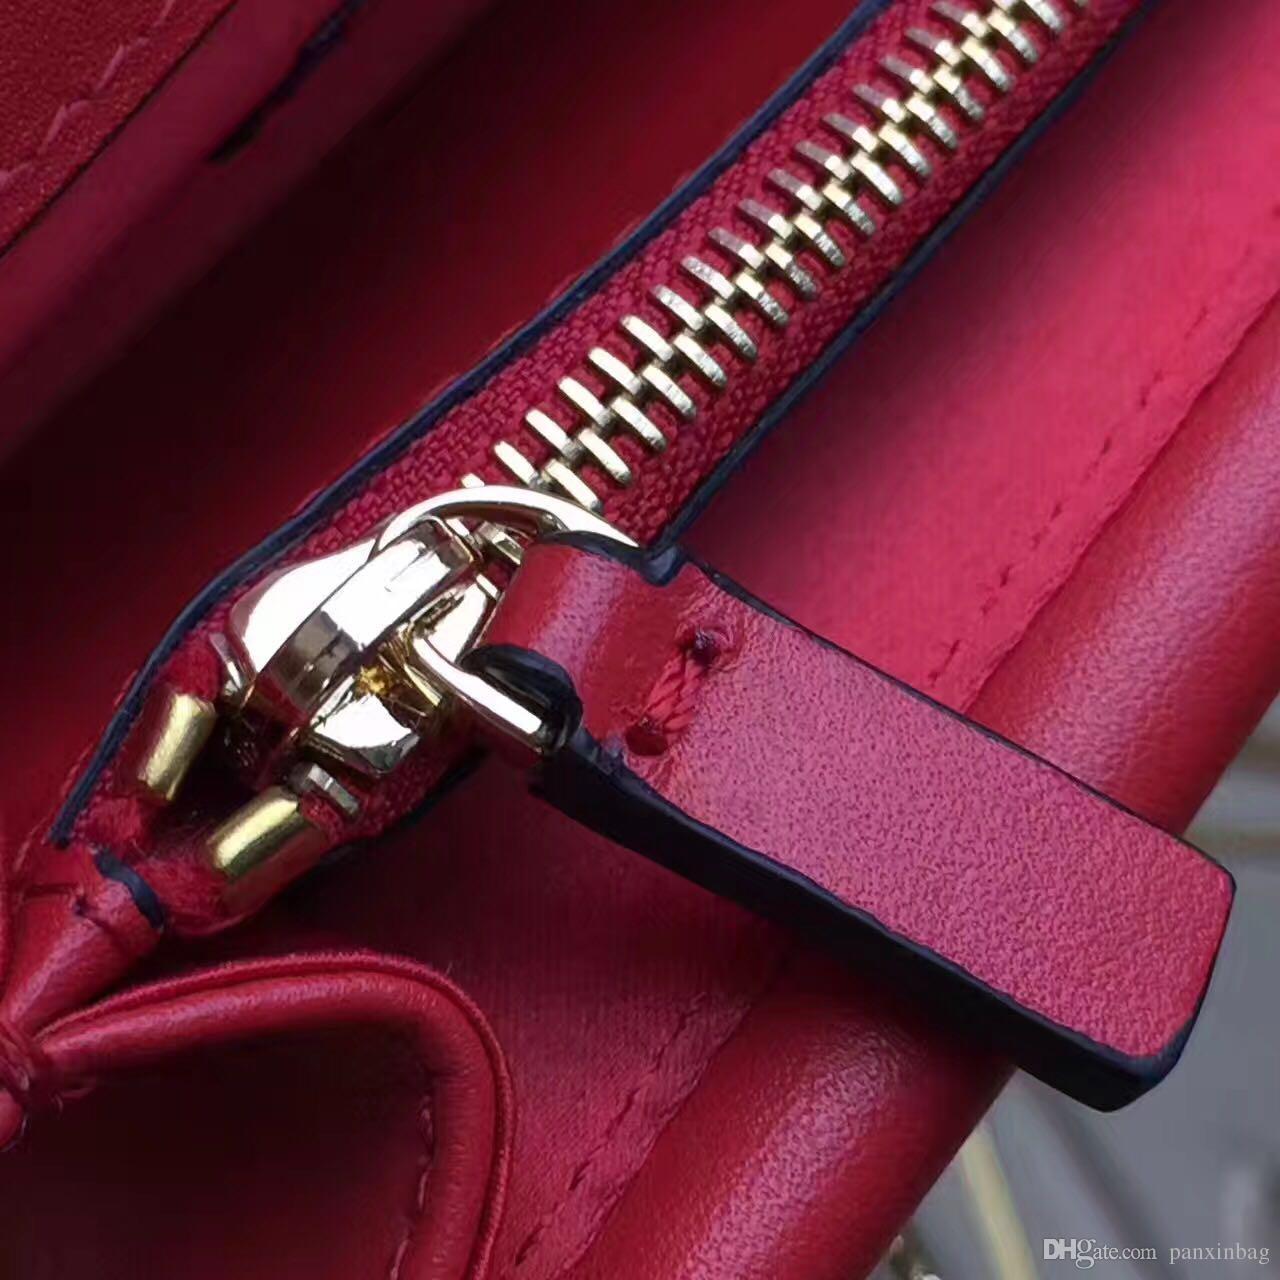 2017 Spring-Summer fahion show vintage metal button genuine leather women's cross body ins bag shoulder bag message bag